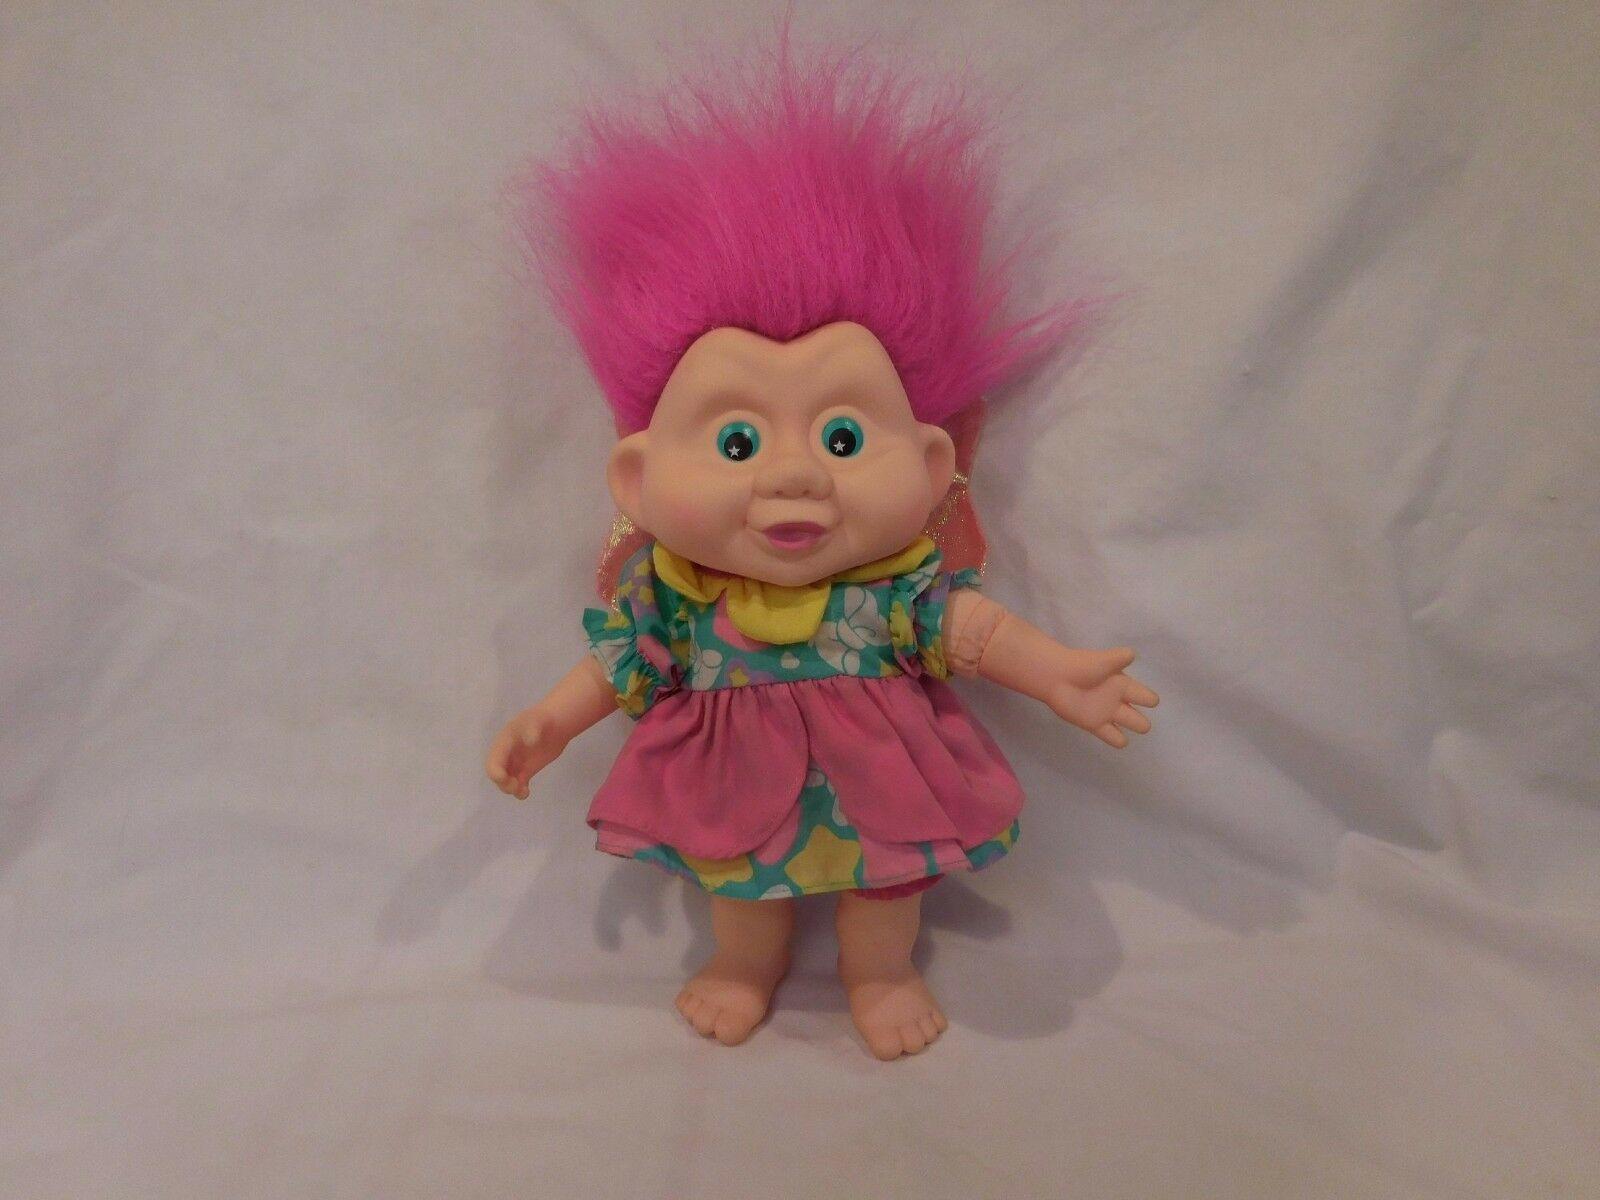 Trolls Magic Doll 1991 Pink Hair Applause PlushWith Wings  Vintage Star Eyes